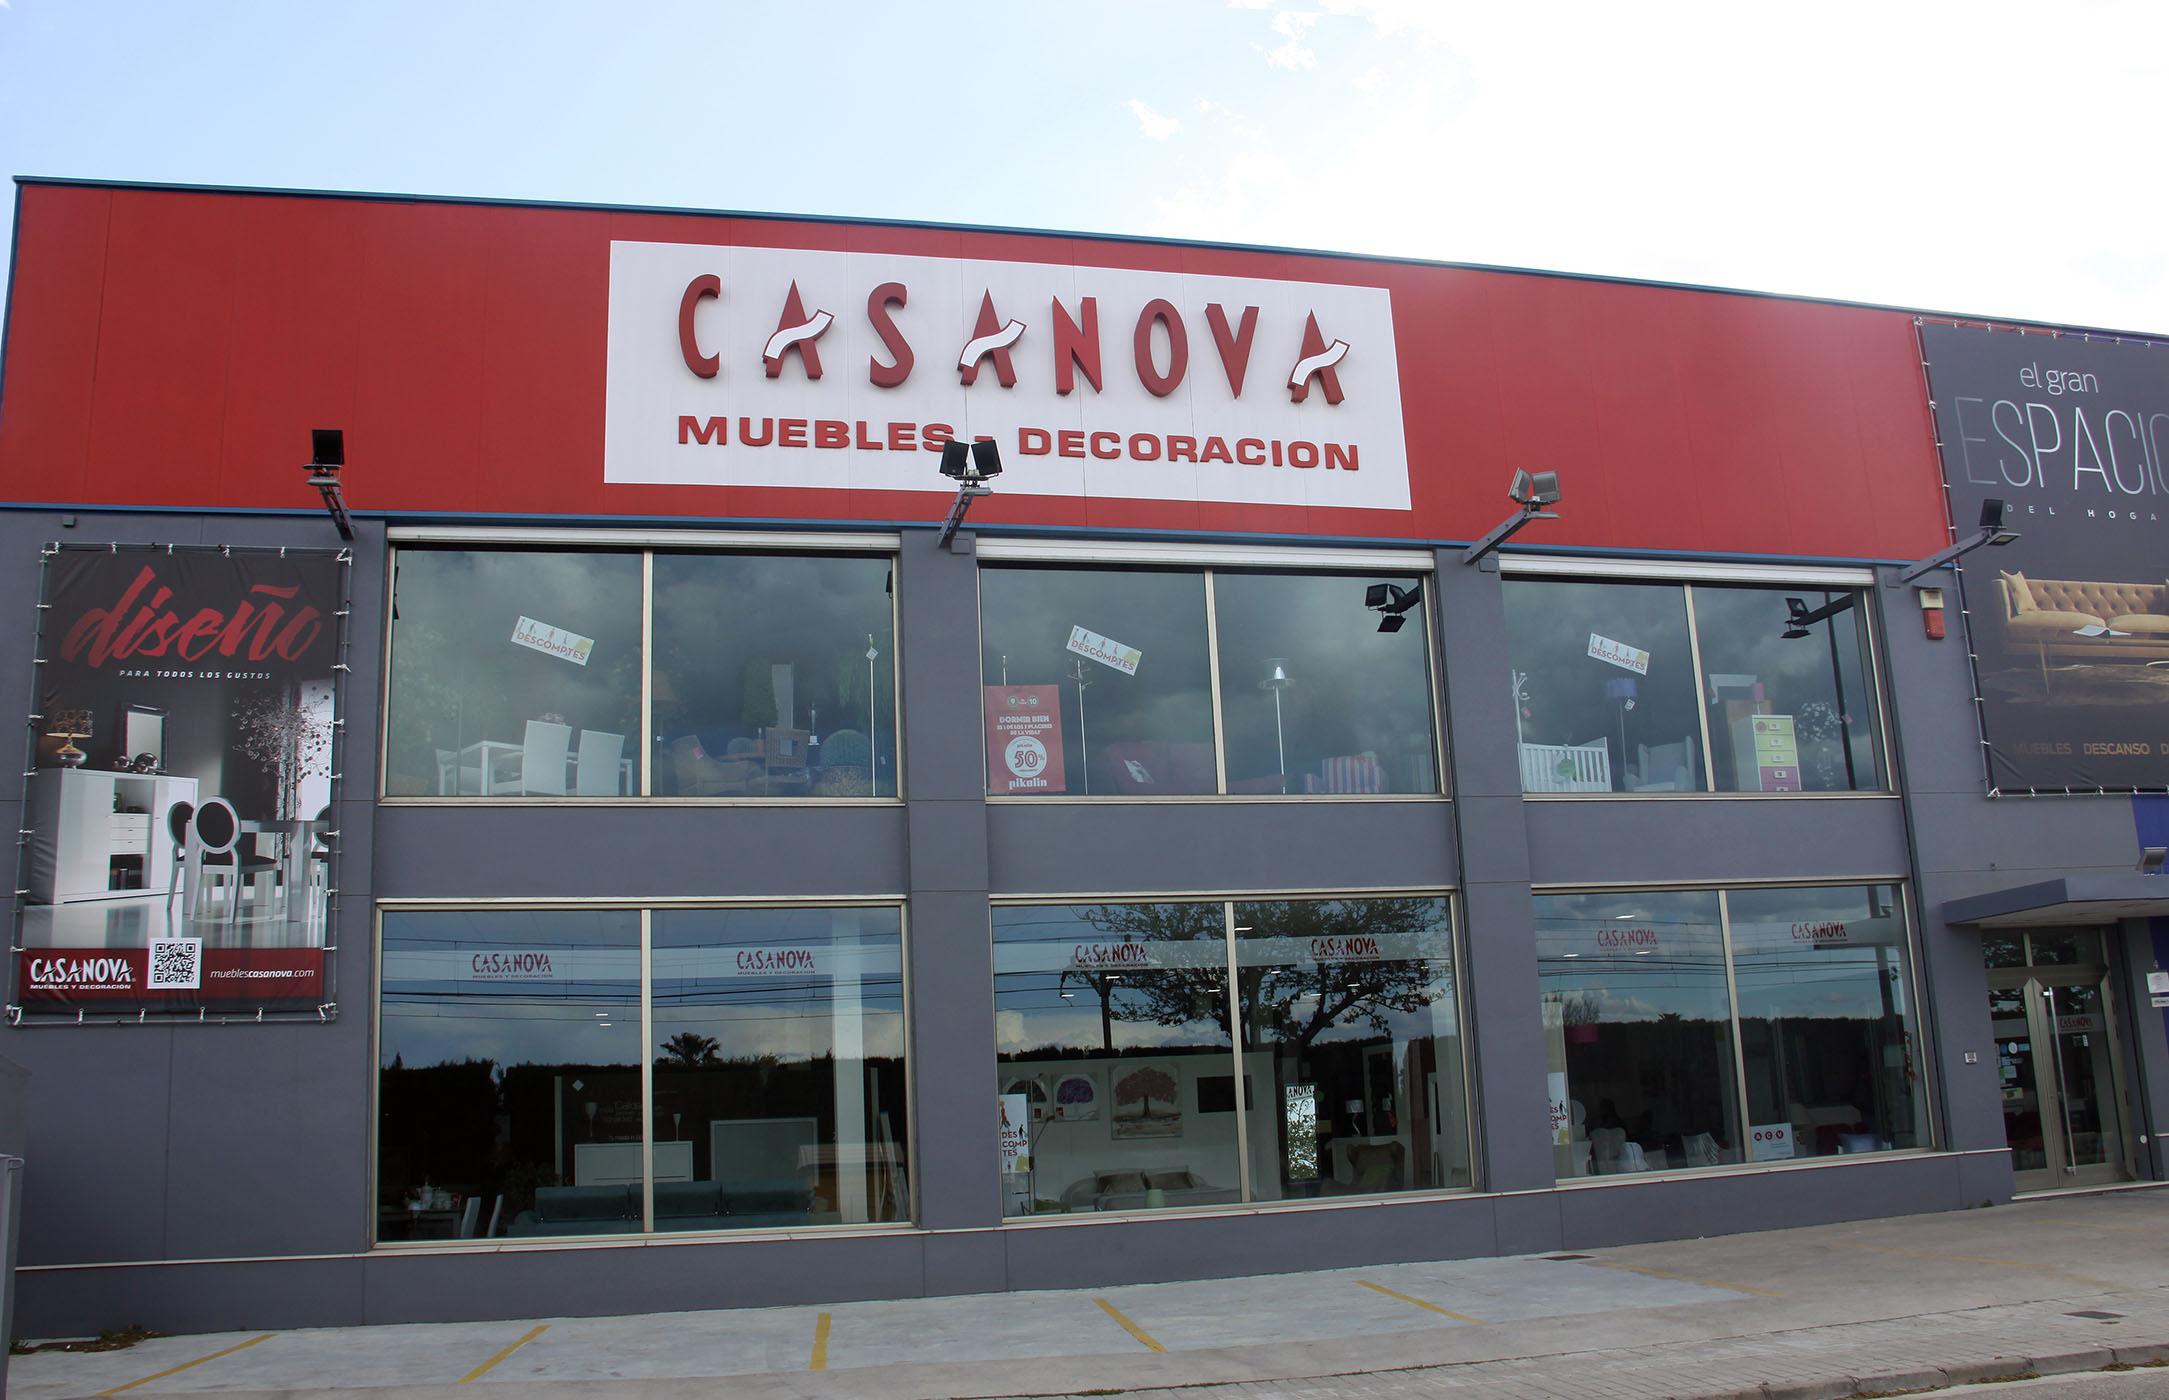 Empresa muebles casanova - Muebles casanova catalogo ...